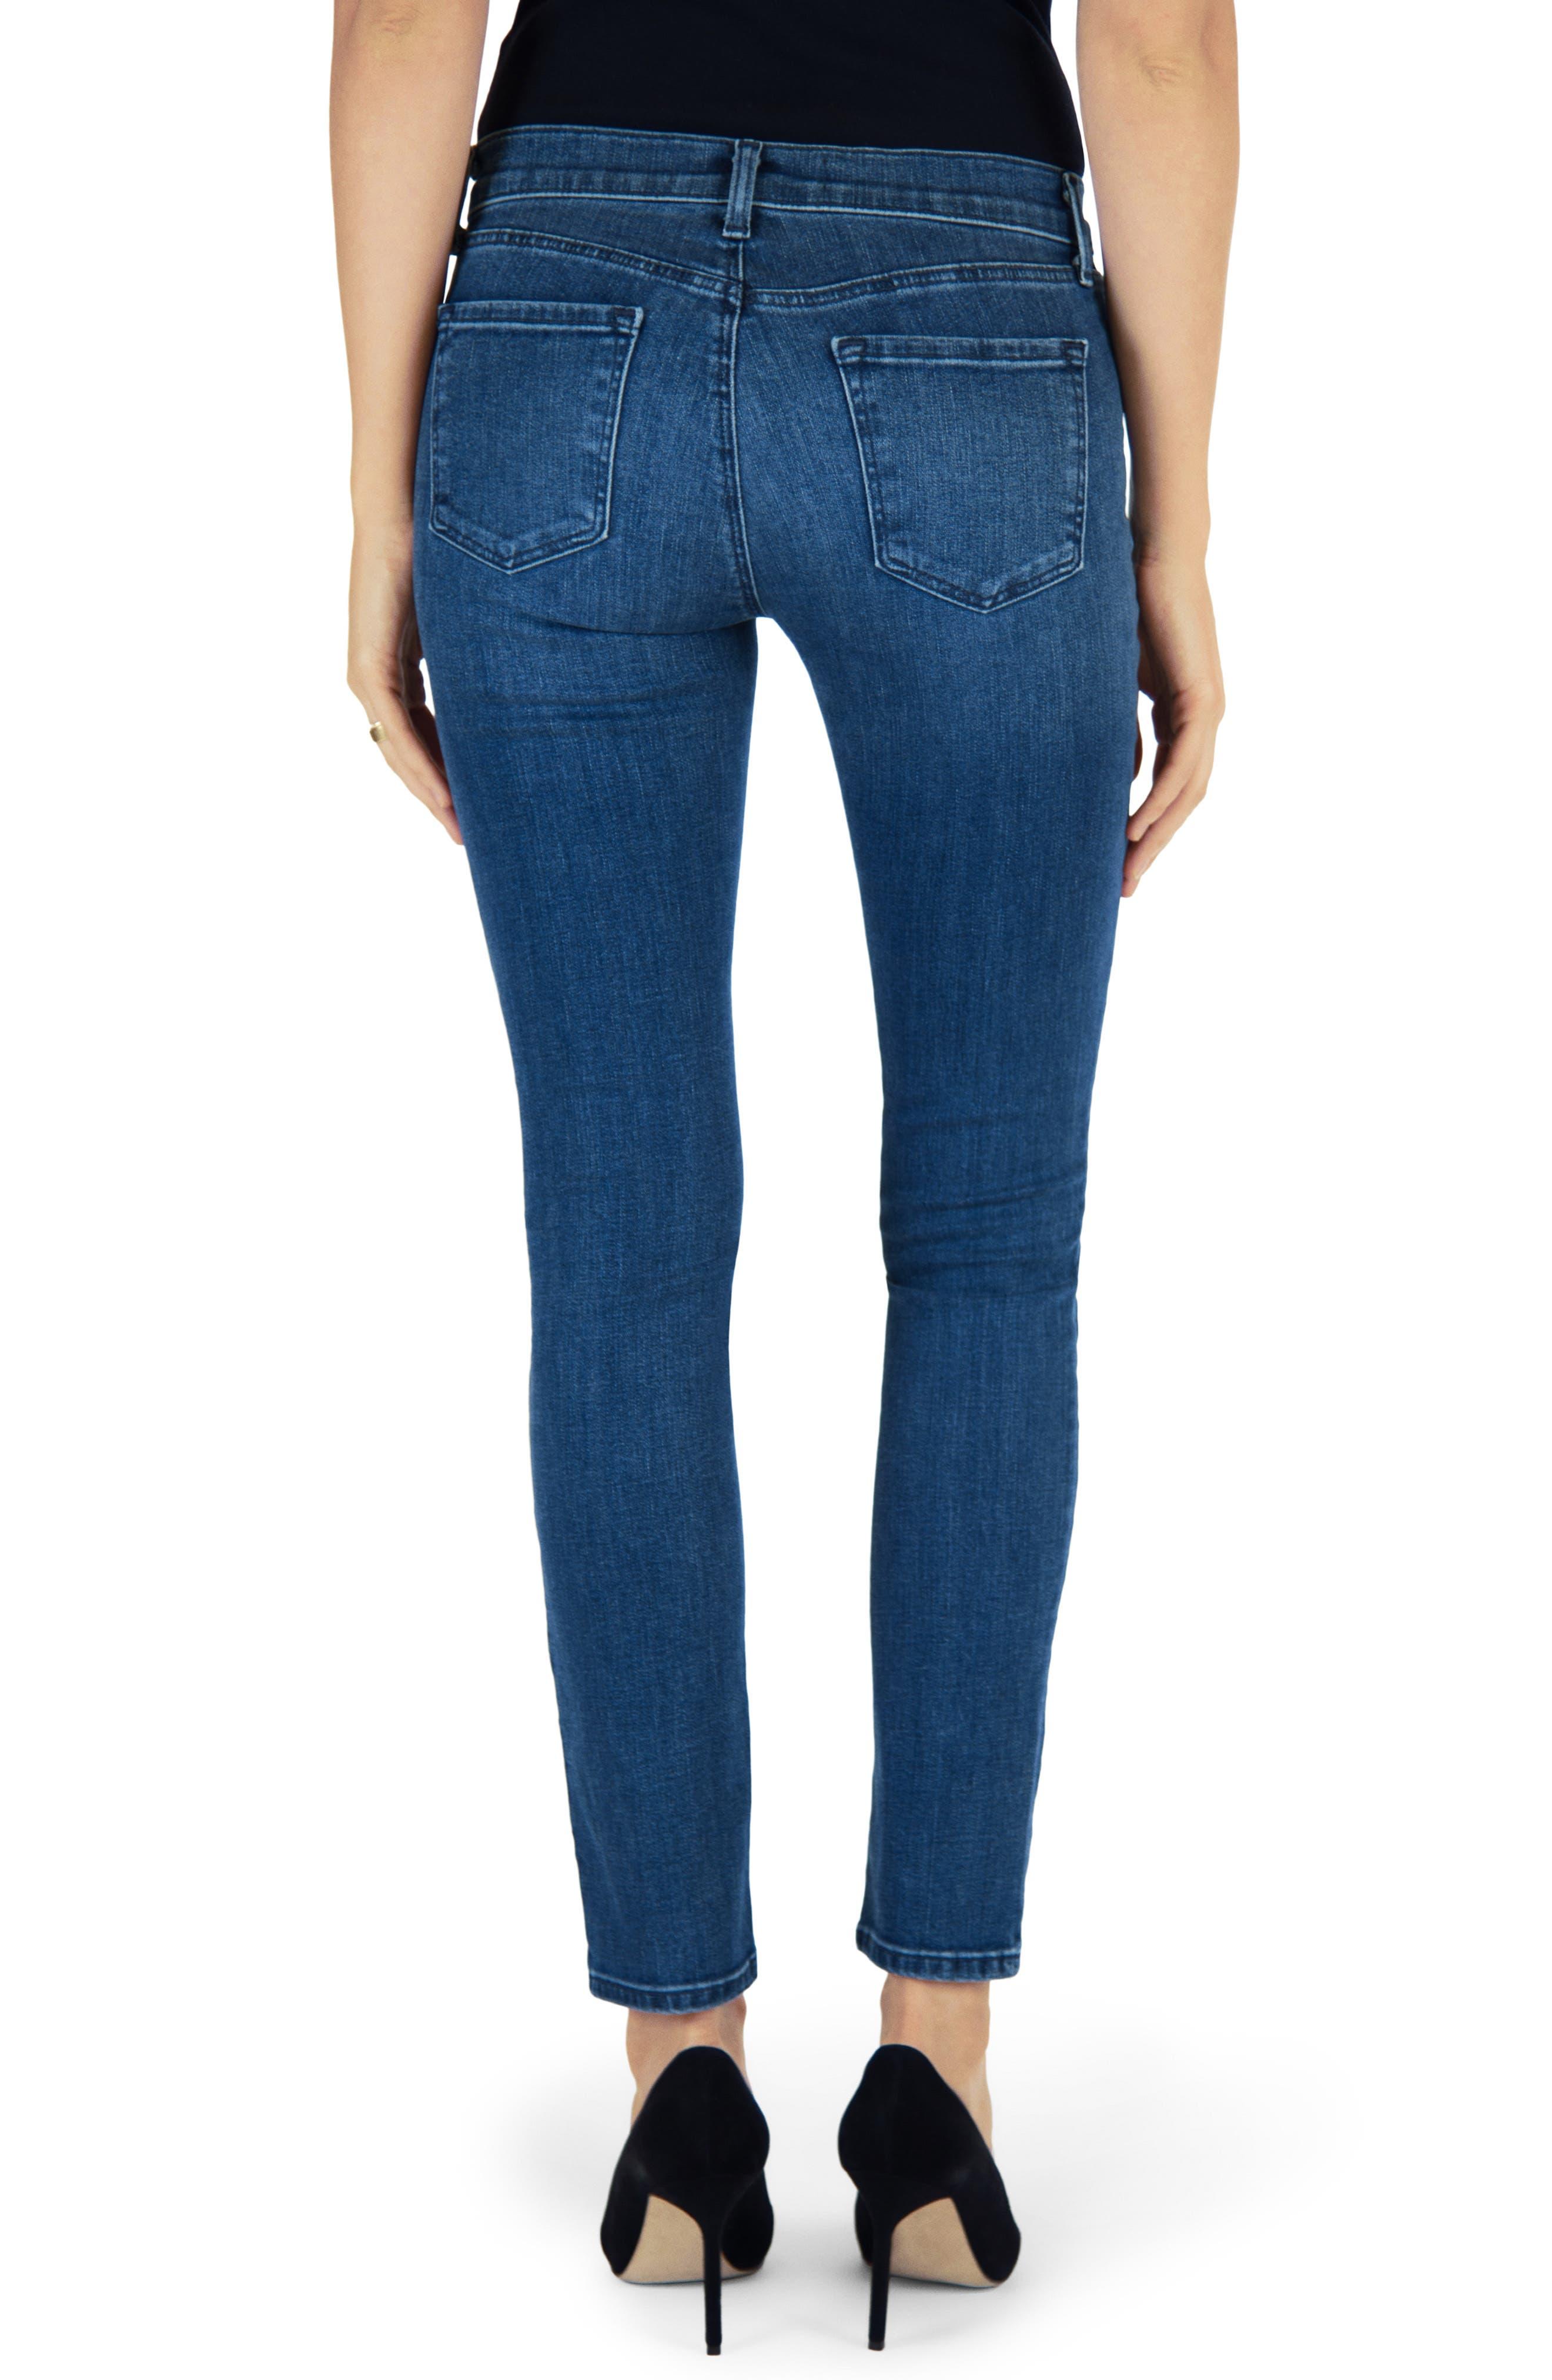 811 Skinny Jeans,                             Alternate thumbnail 2, color,                             400